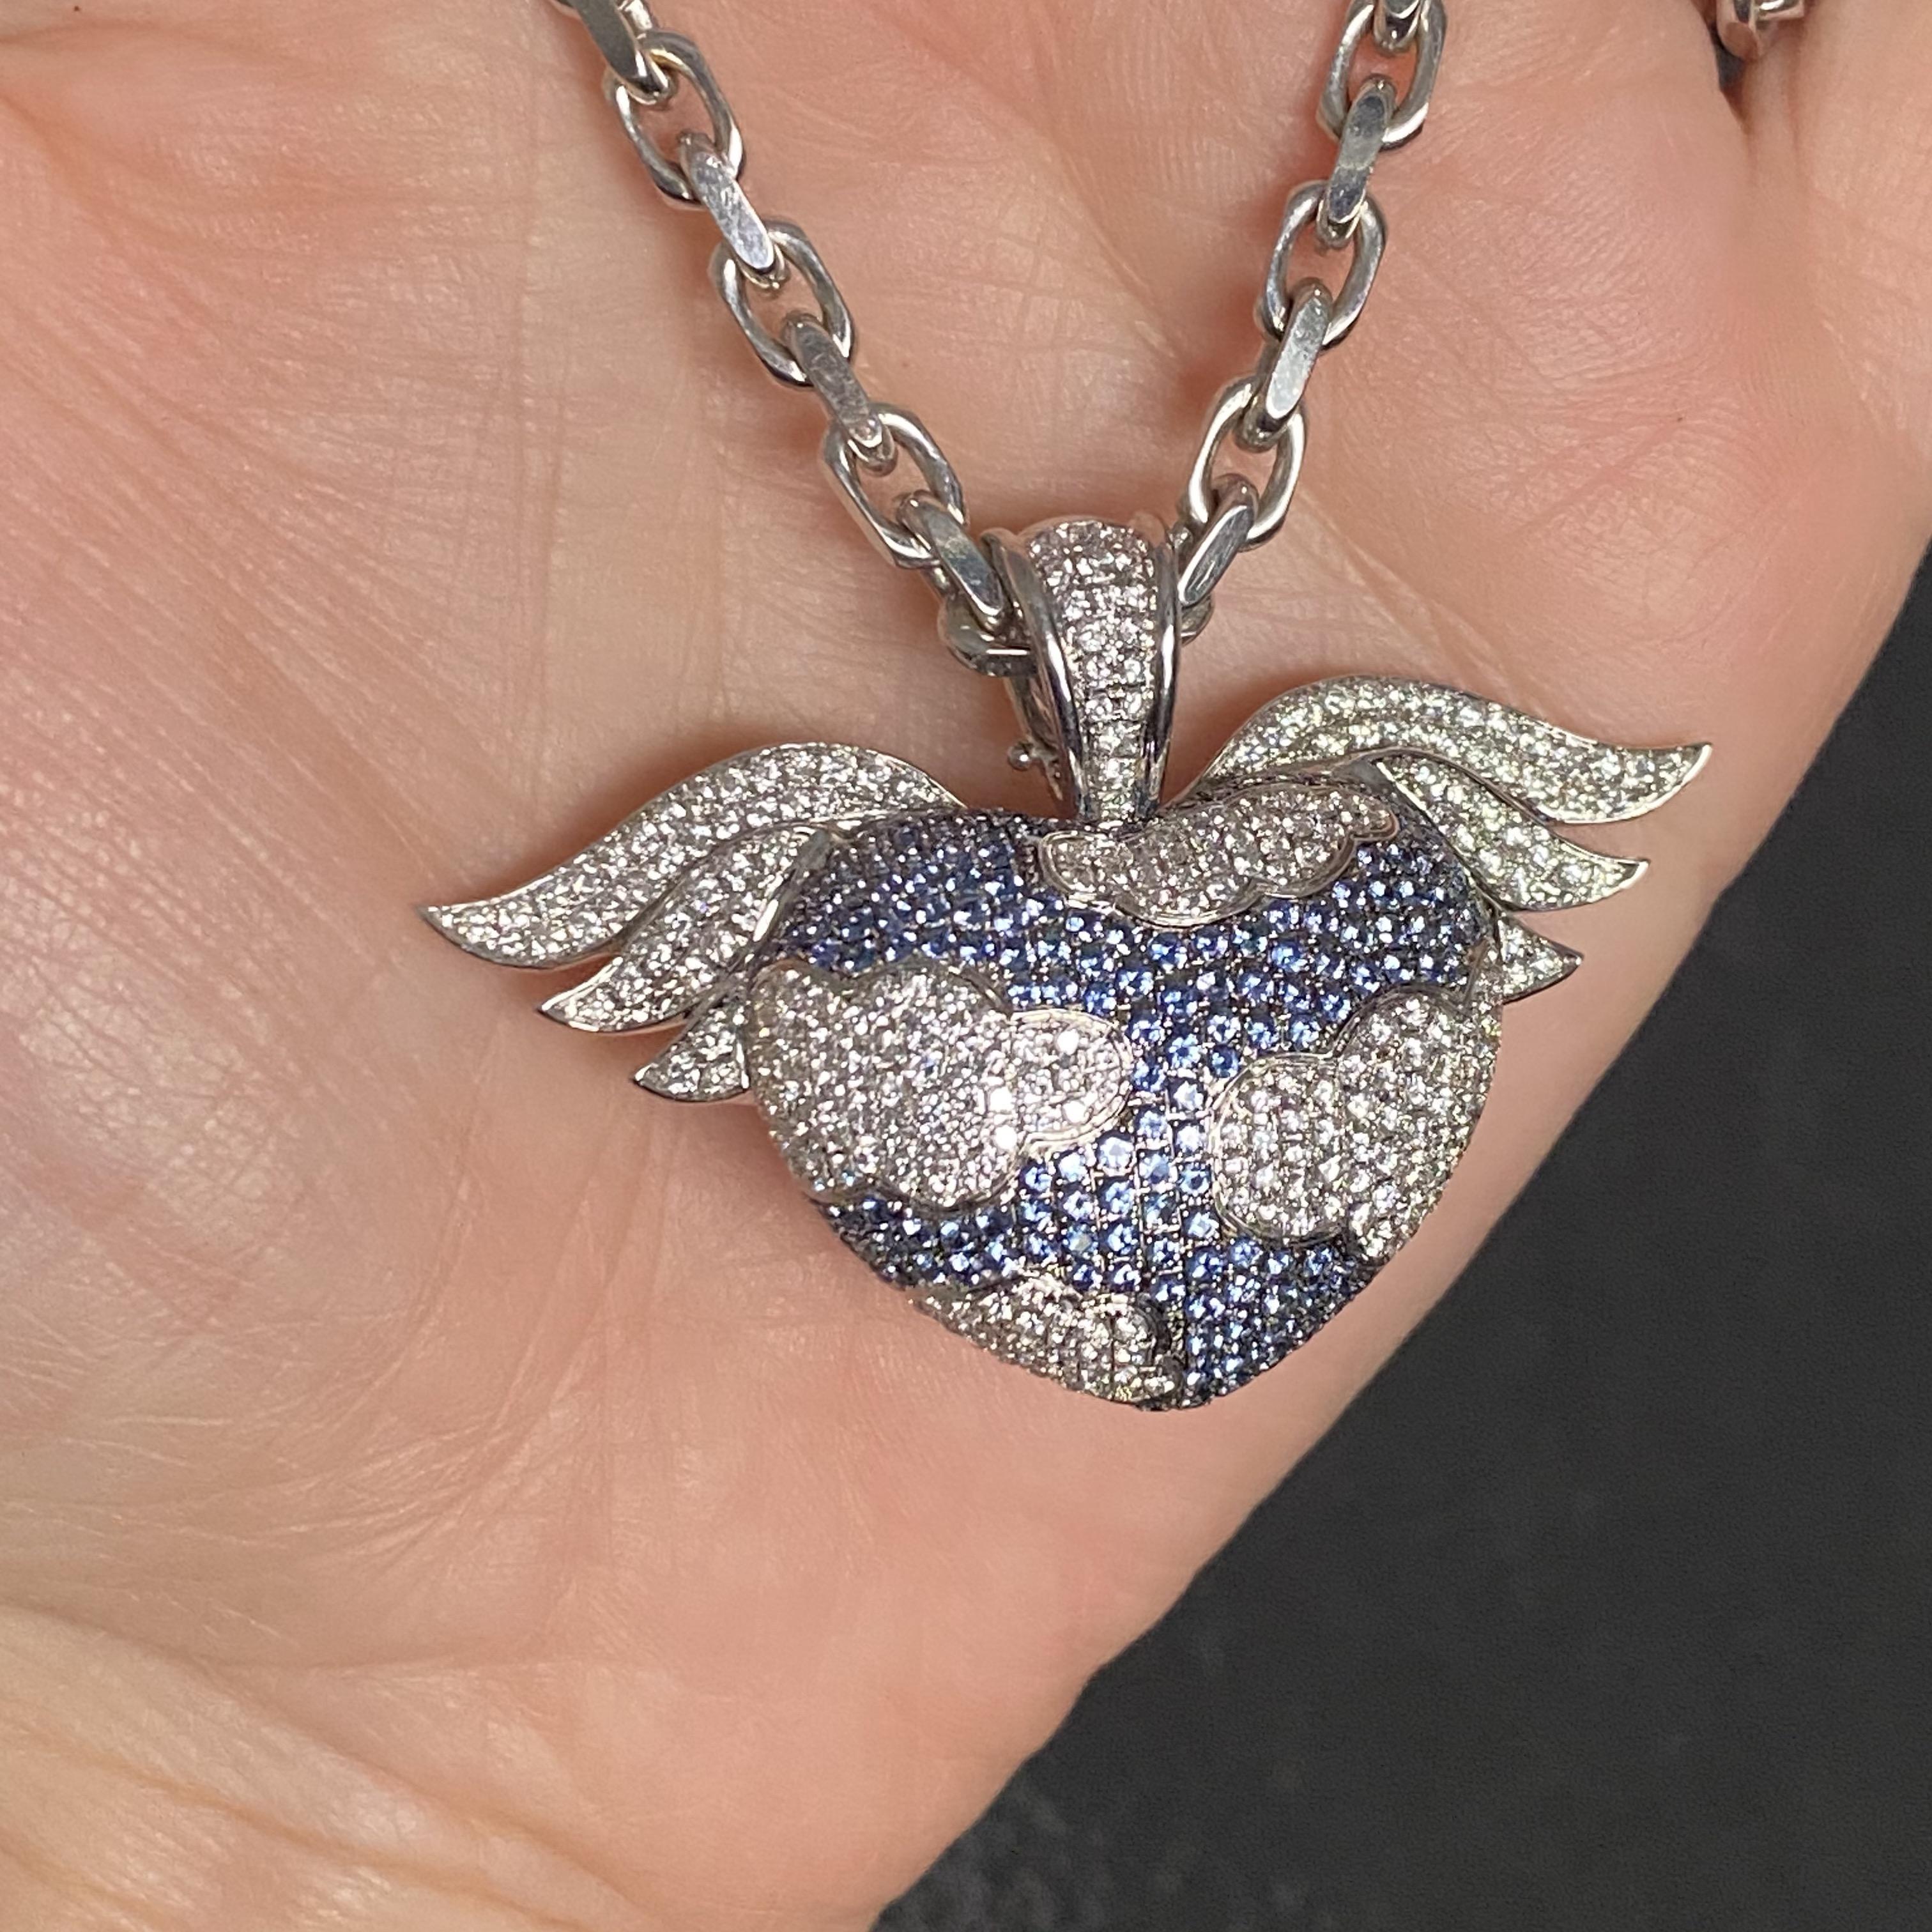 Jewellery - Image 4 of 5